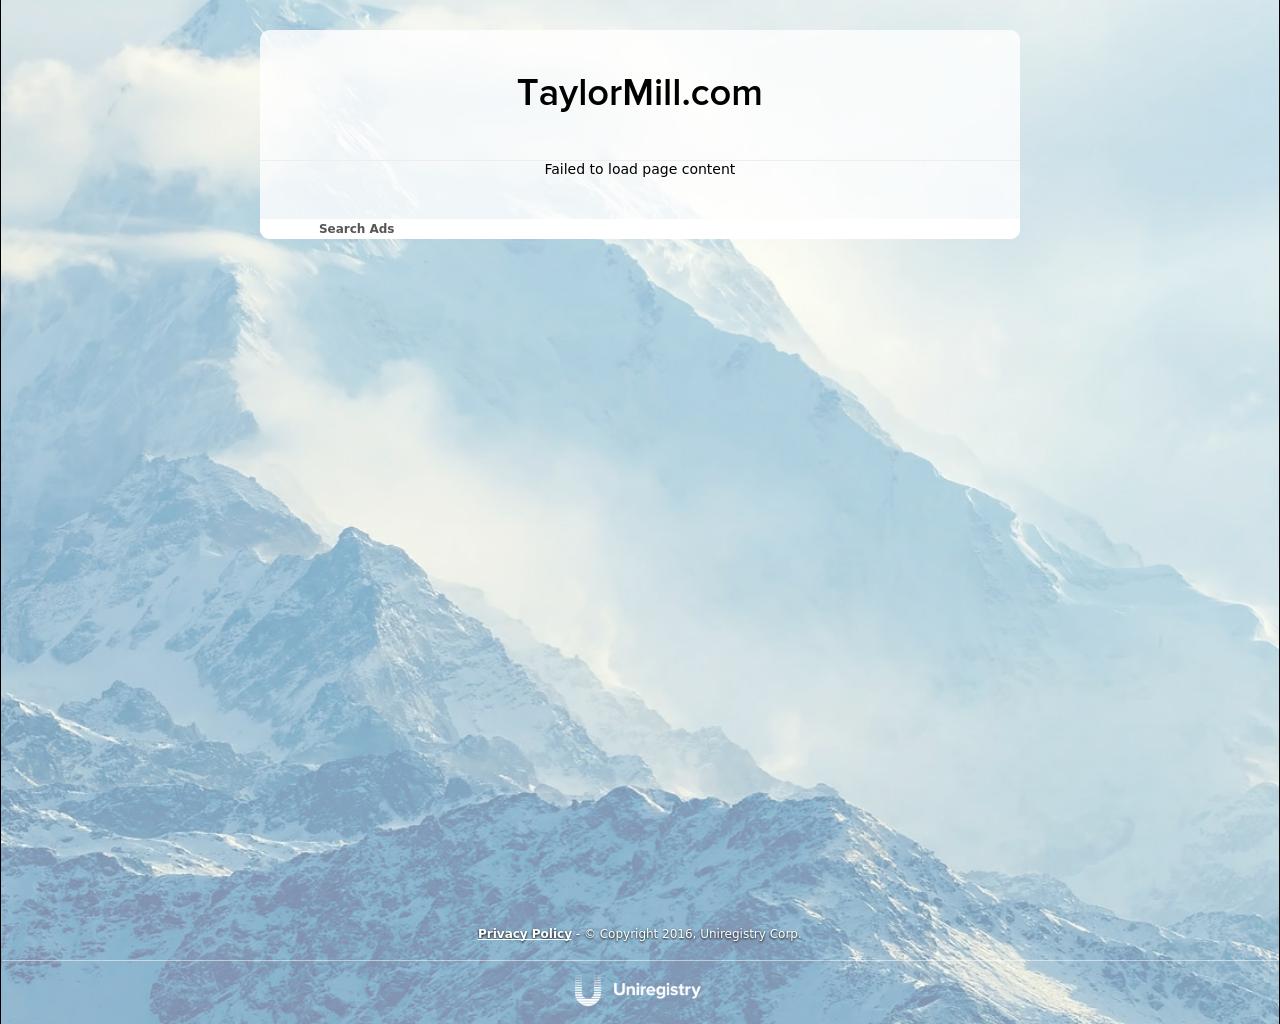 TaylorMill.com-Advertising-Reviews-Pricing